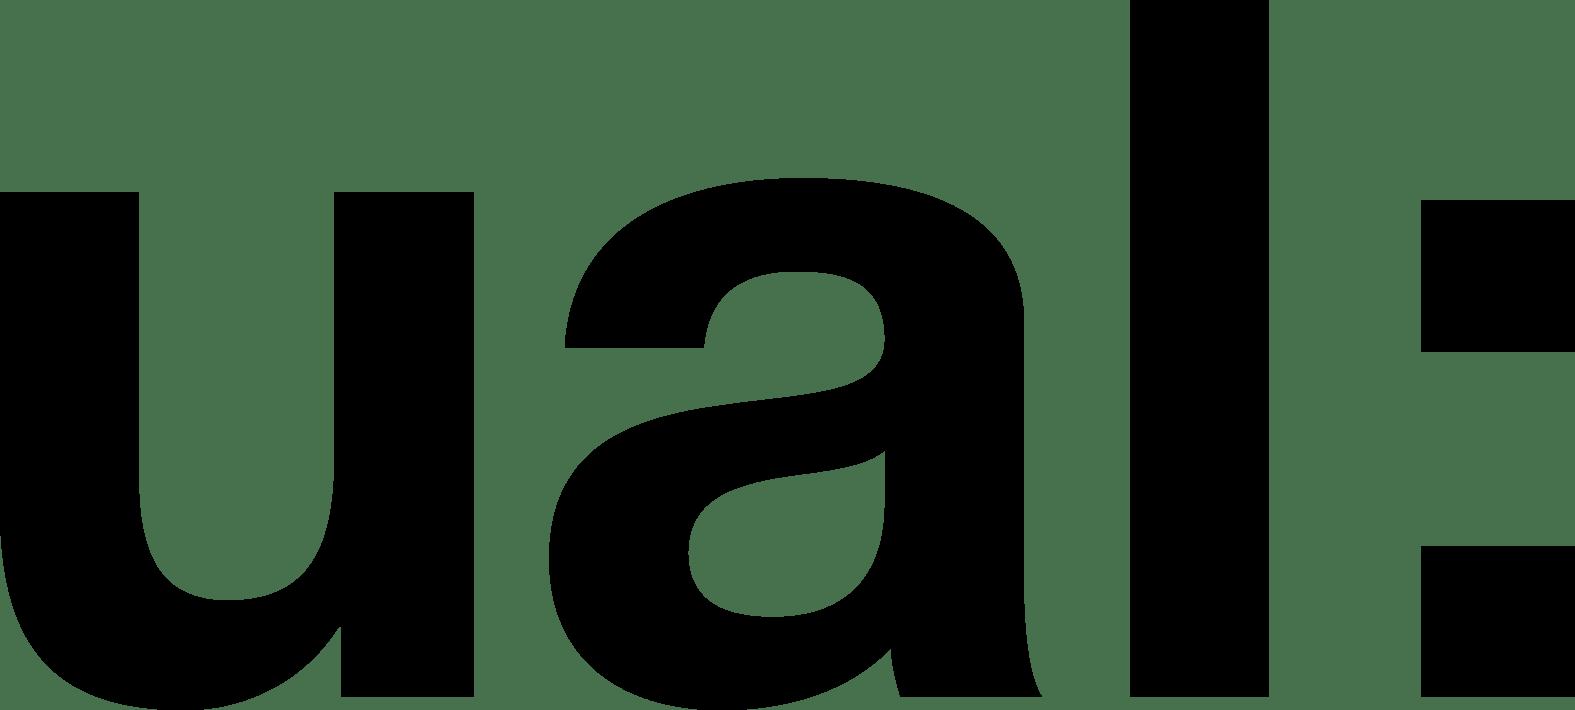 University of Arts London logo